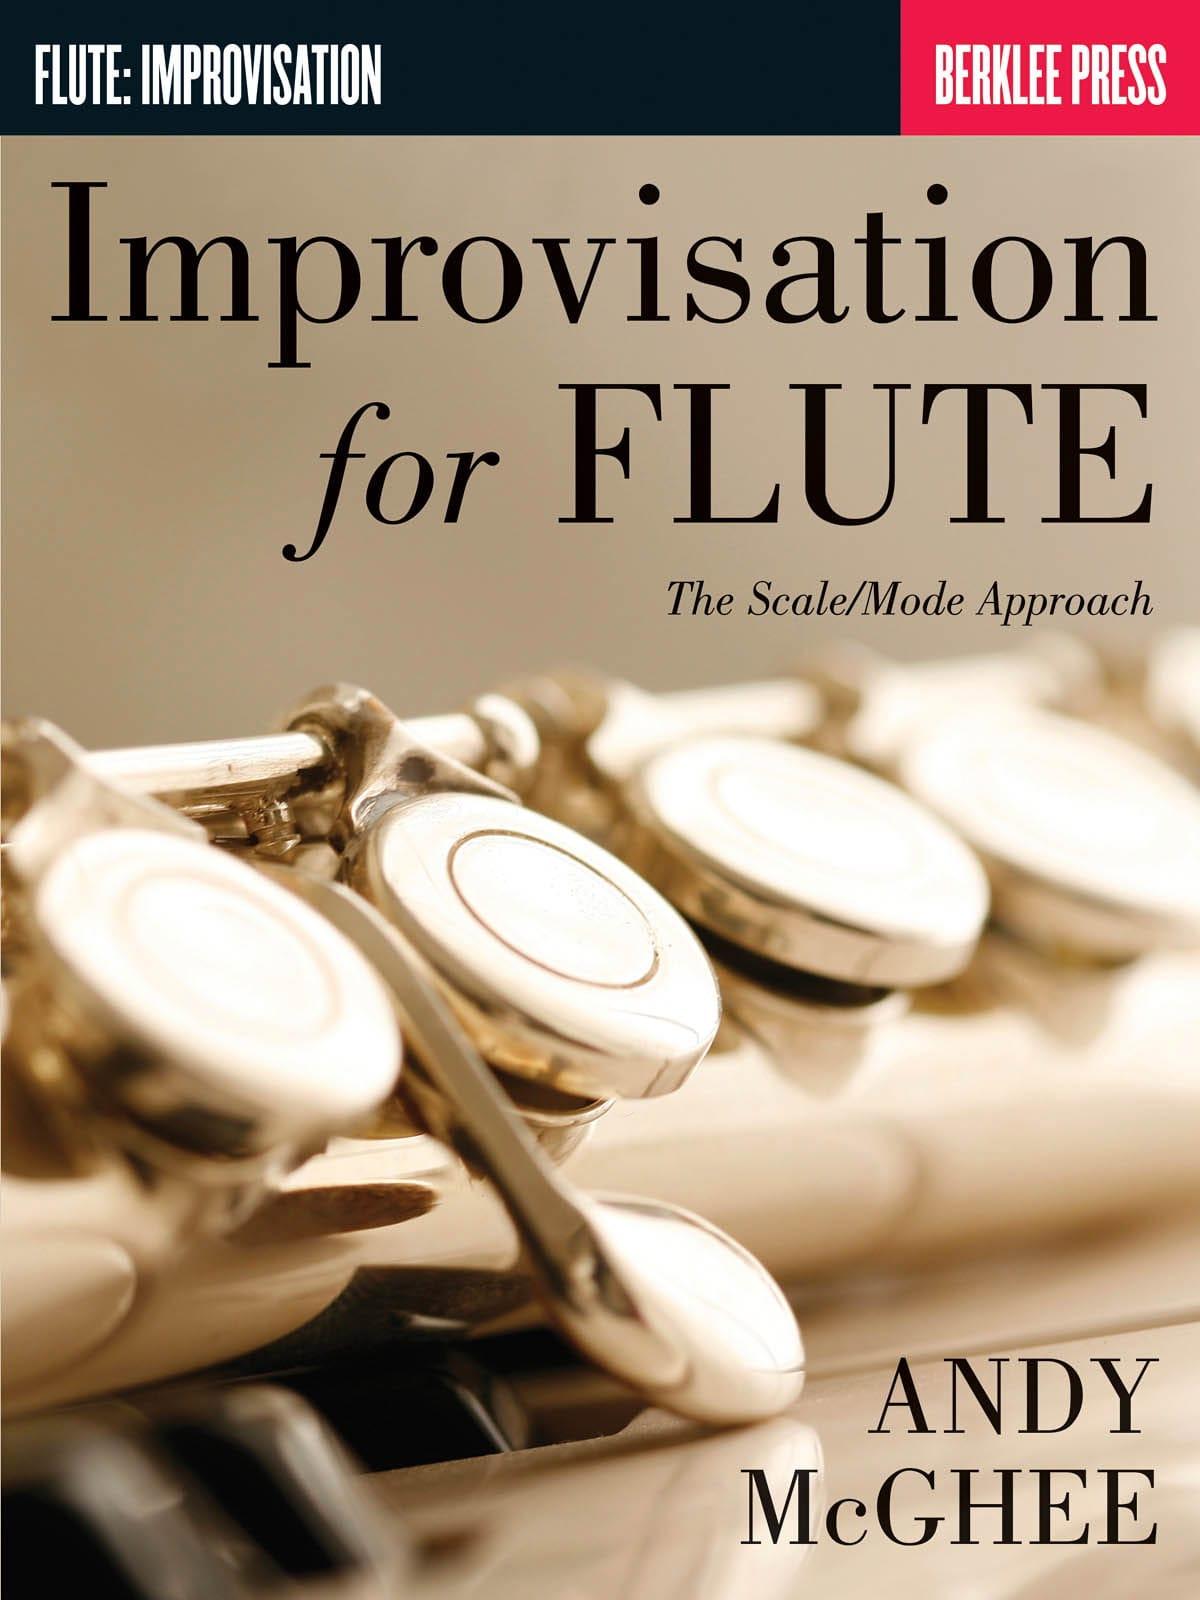 Improvisation For Flute - Andy McGhee - Partition - laflutedepan.com